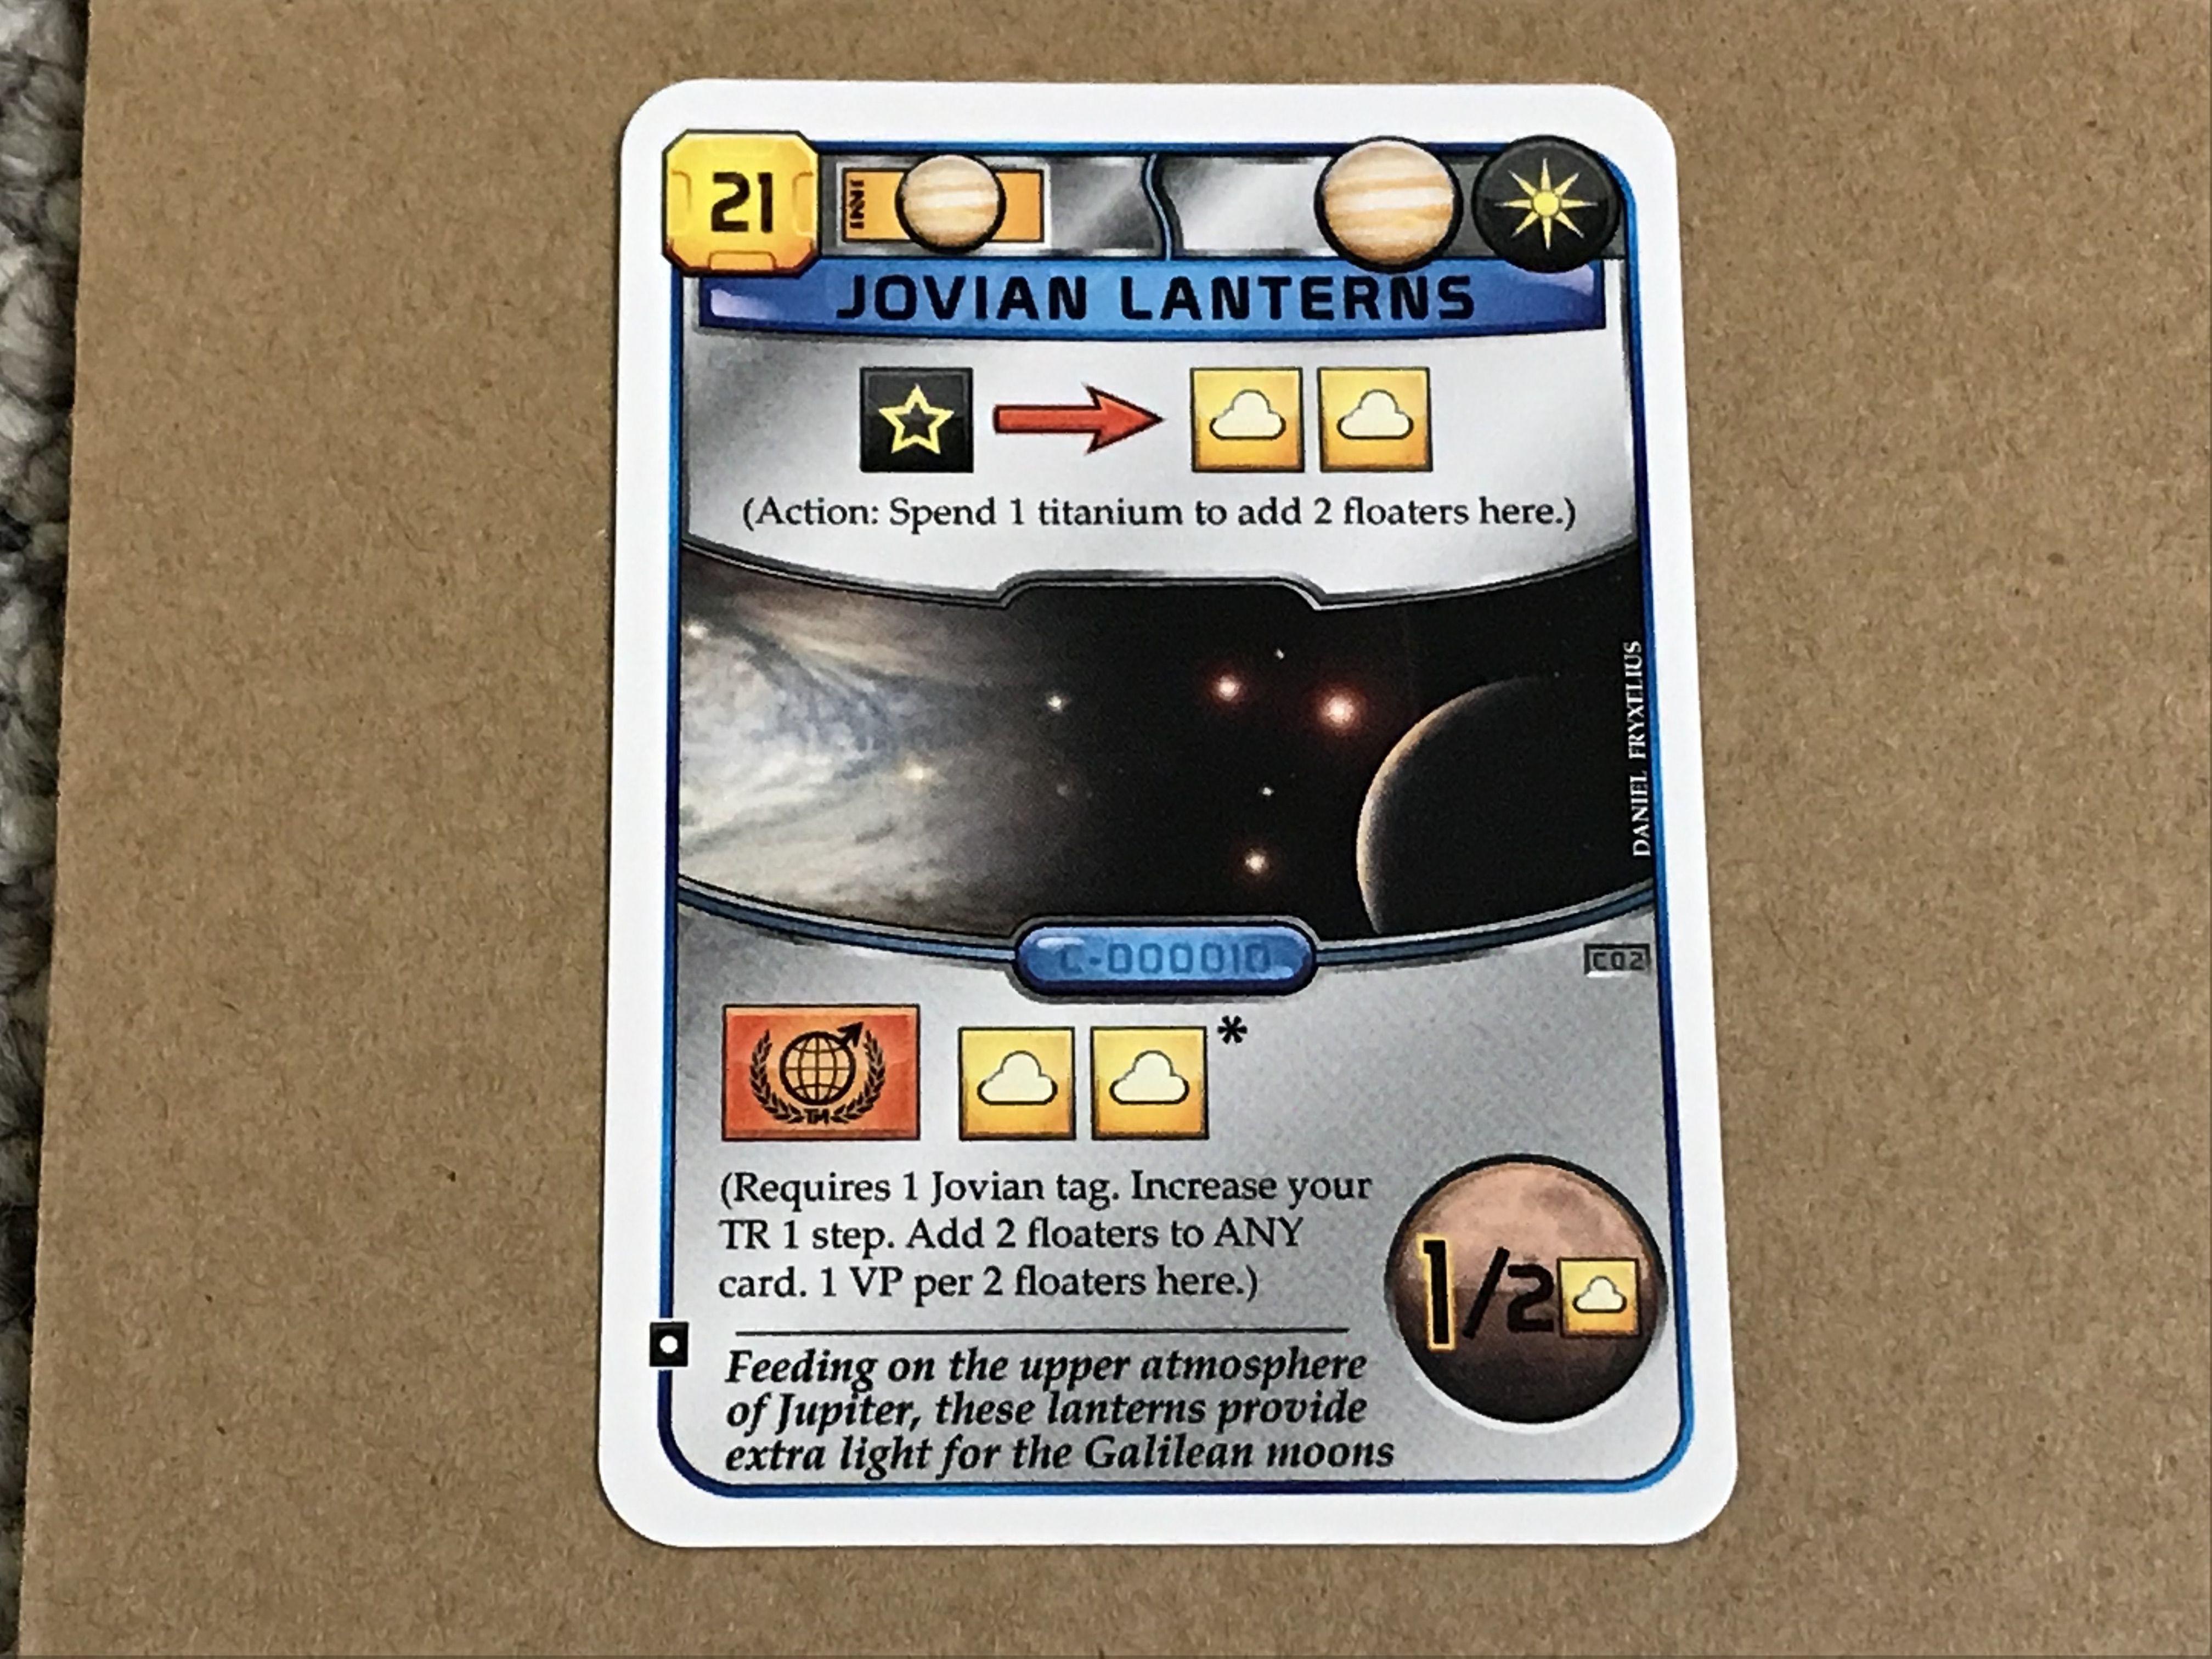 Terraforming Mars: Jovian Lanterns Promo Card